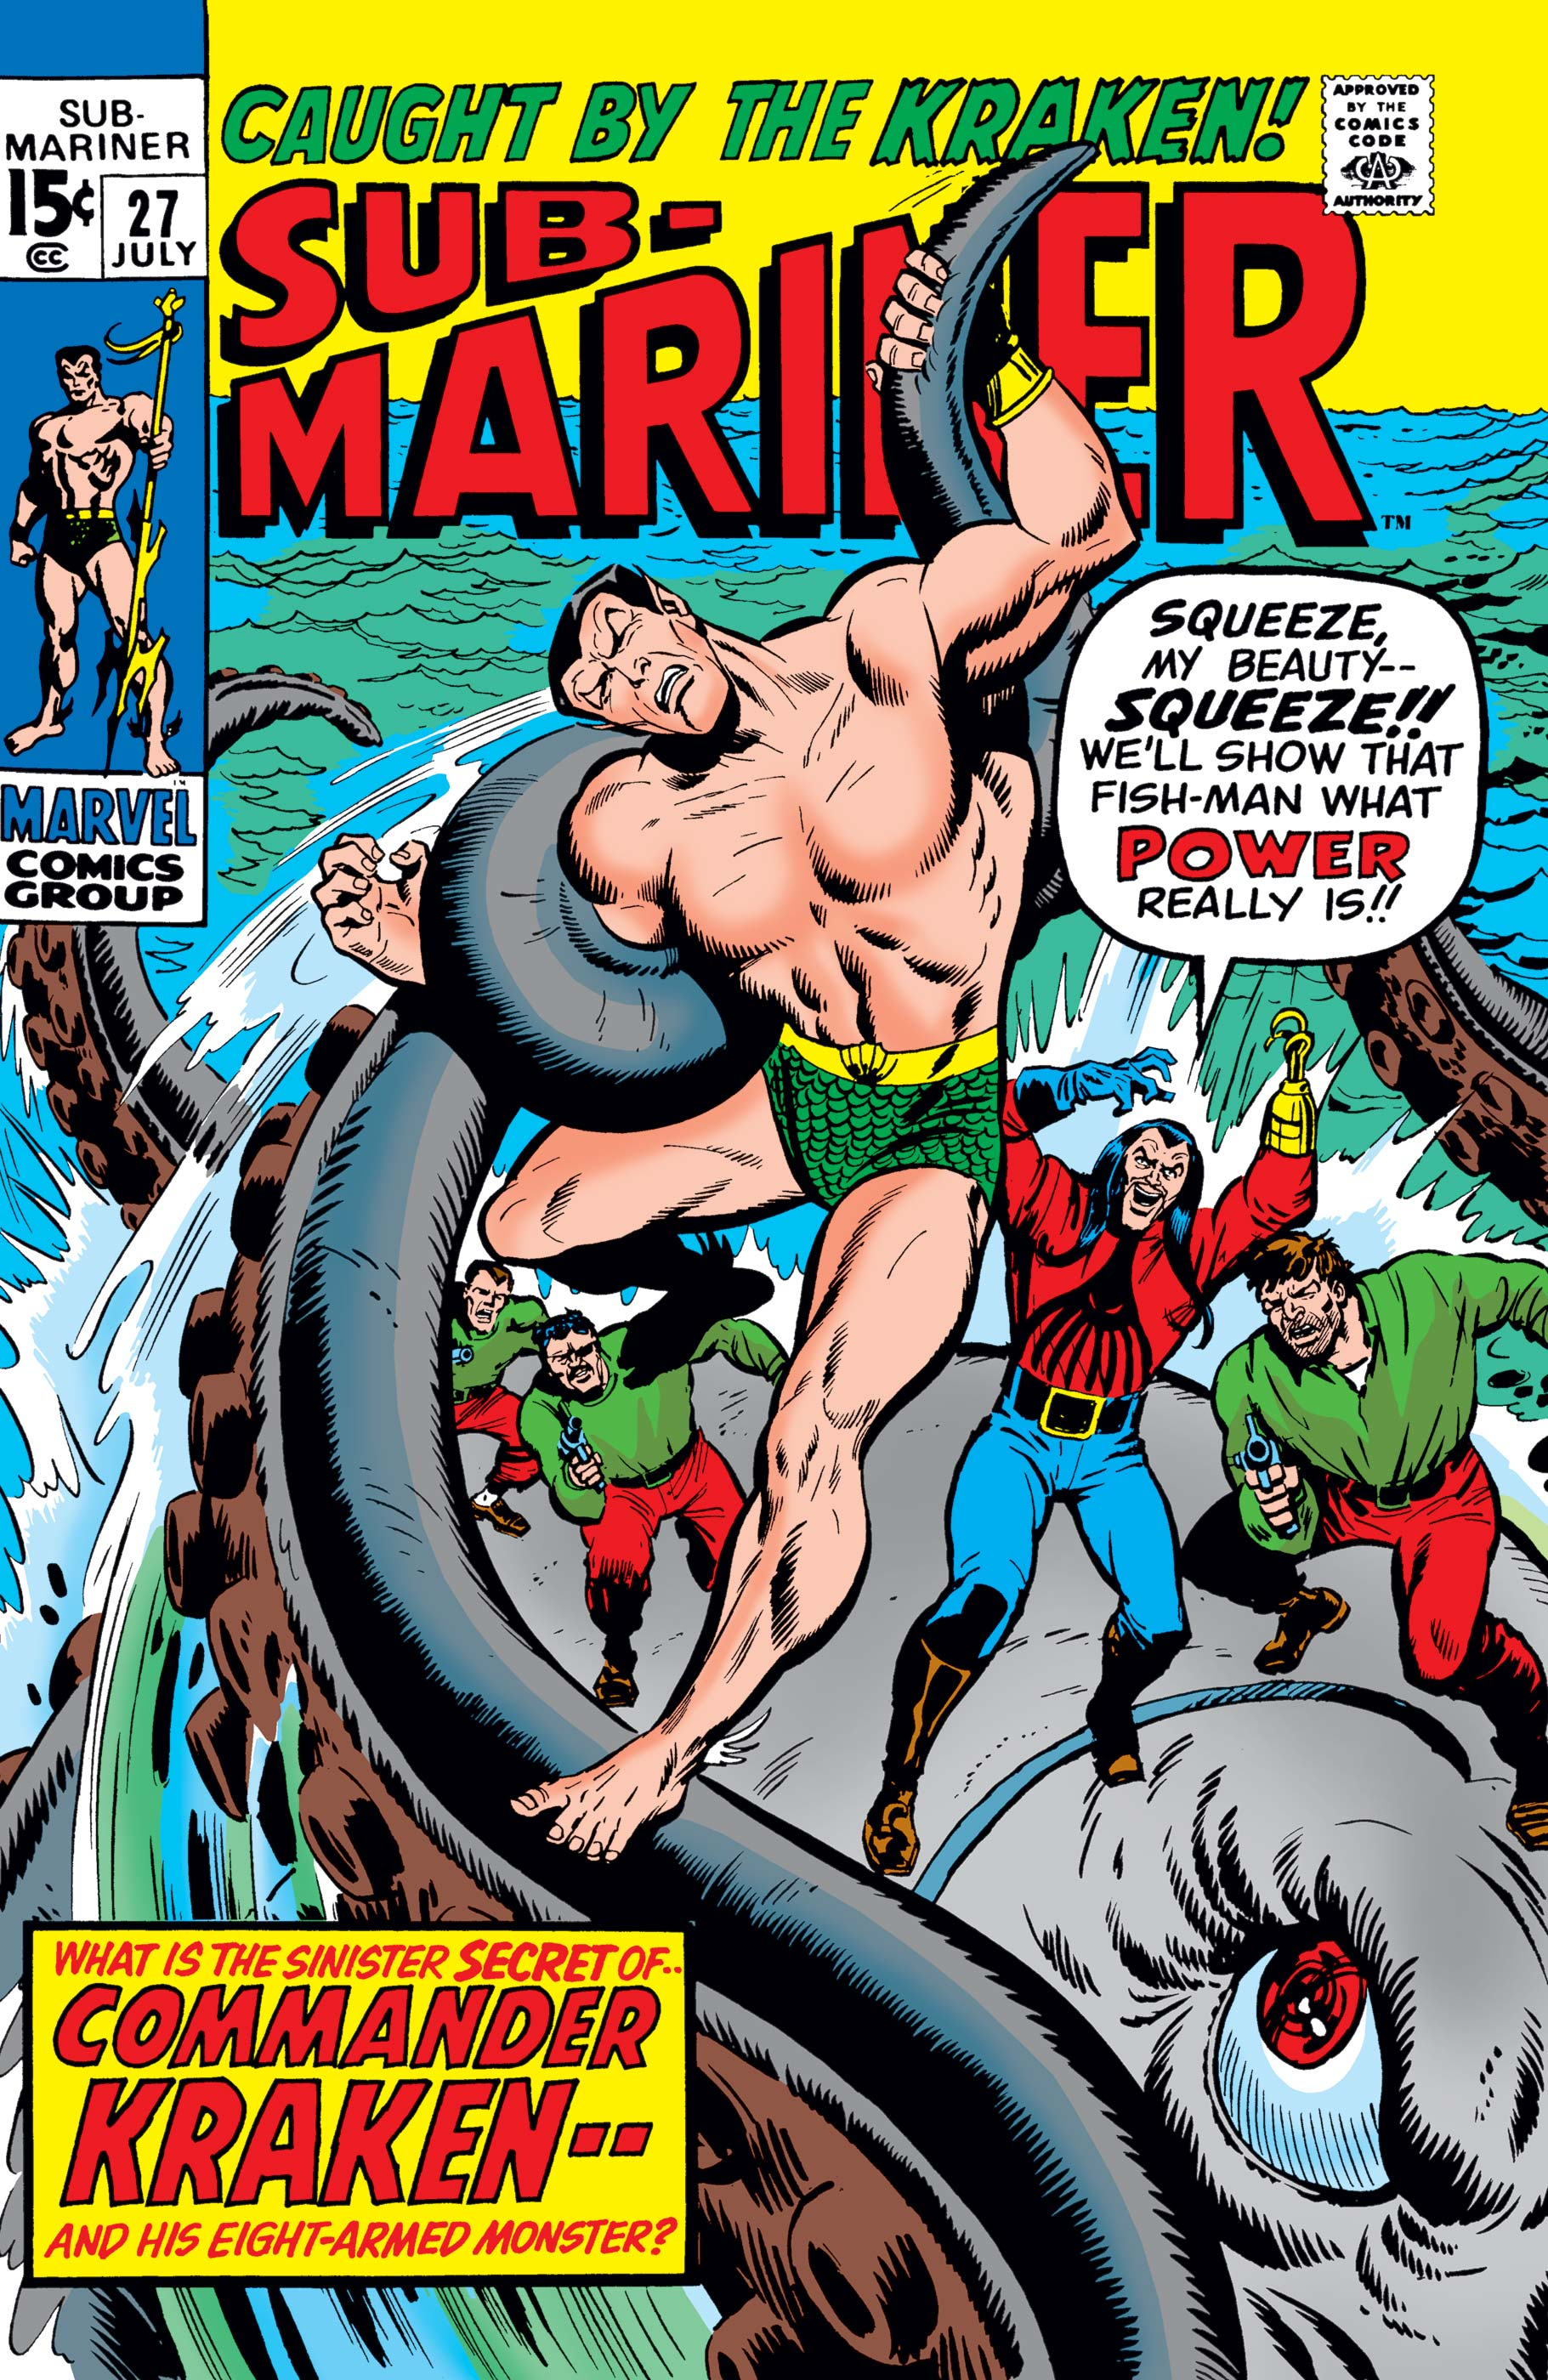 Sub-Mariner (1968) #27